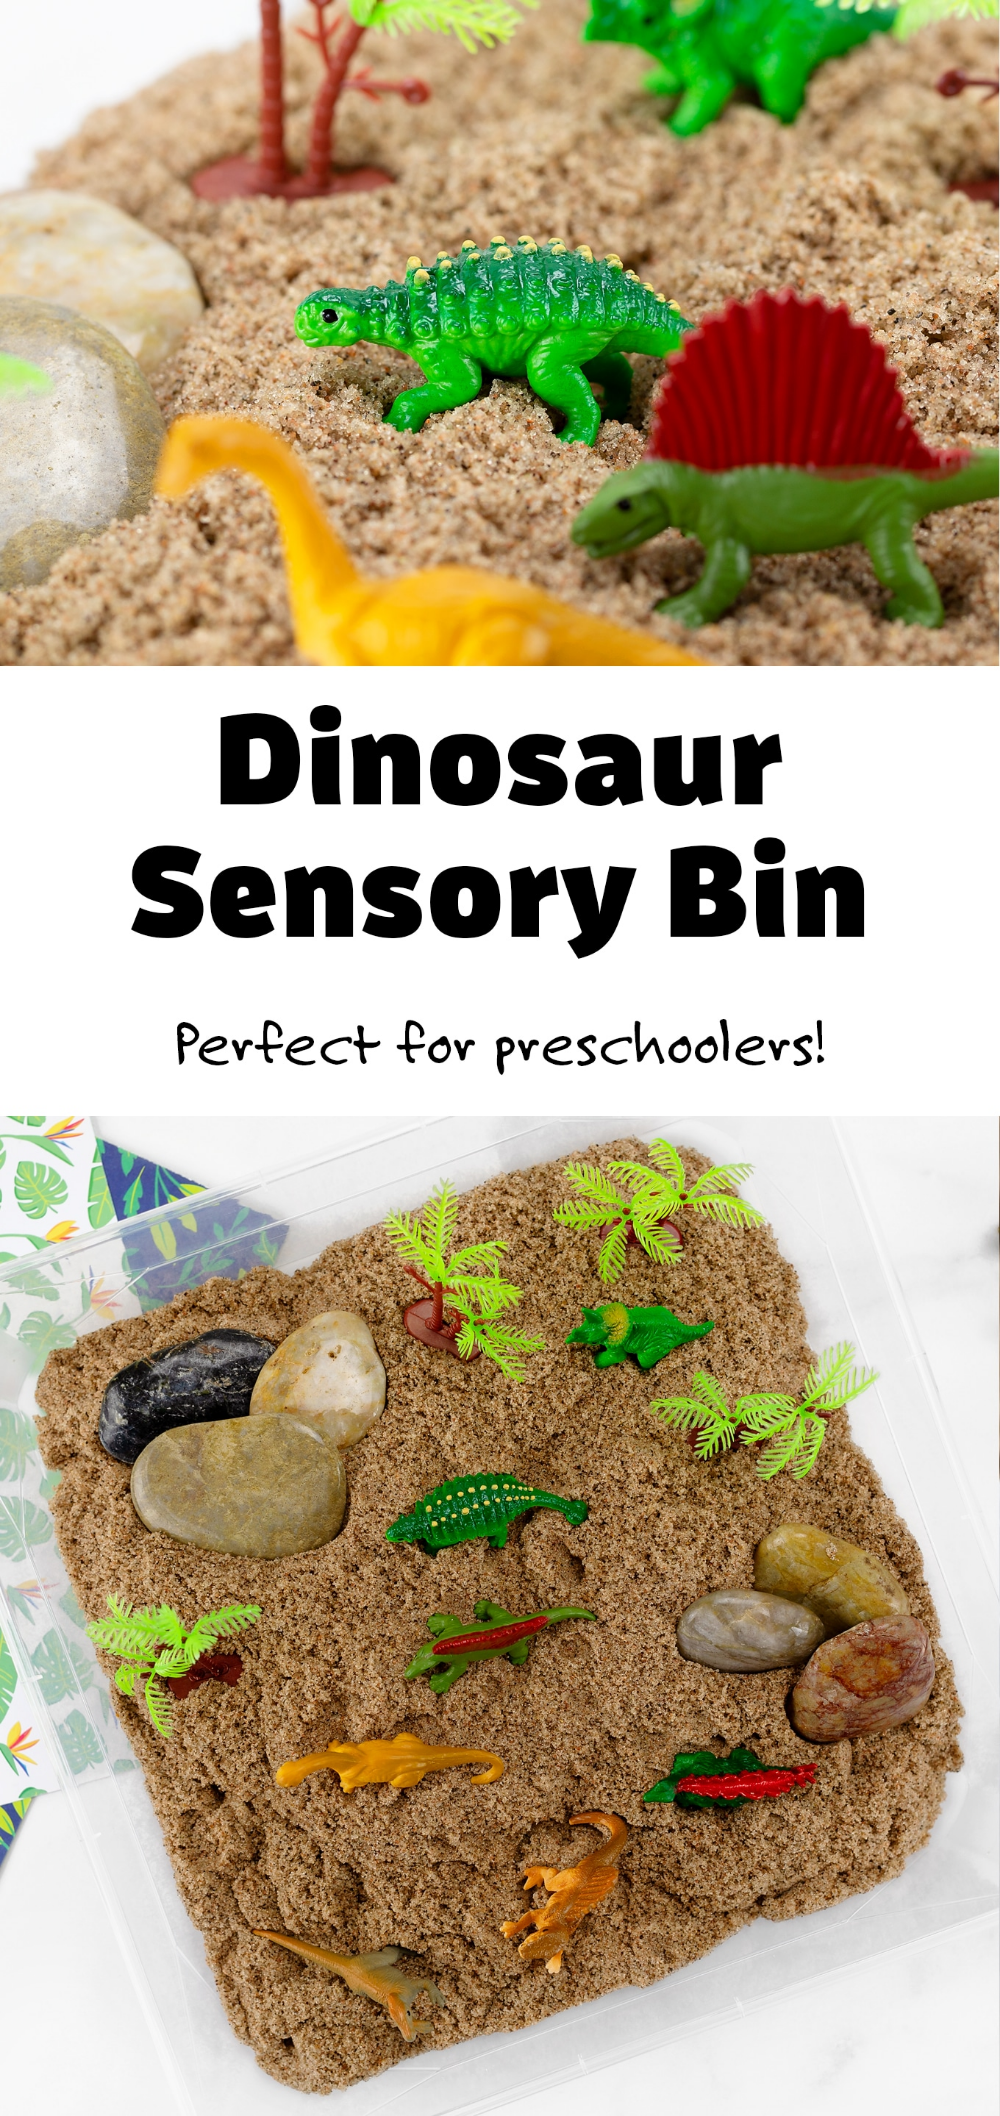 Dinosaur Sensory Bin | Fireflies and Mud Pies